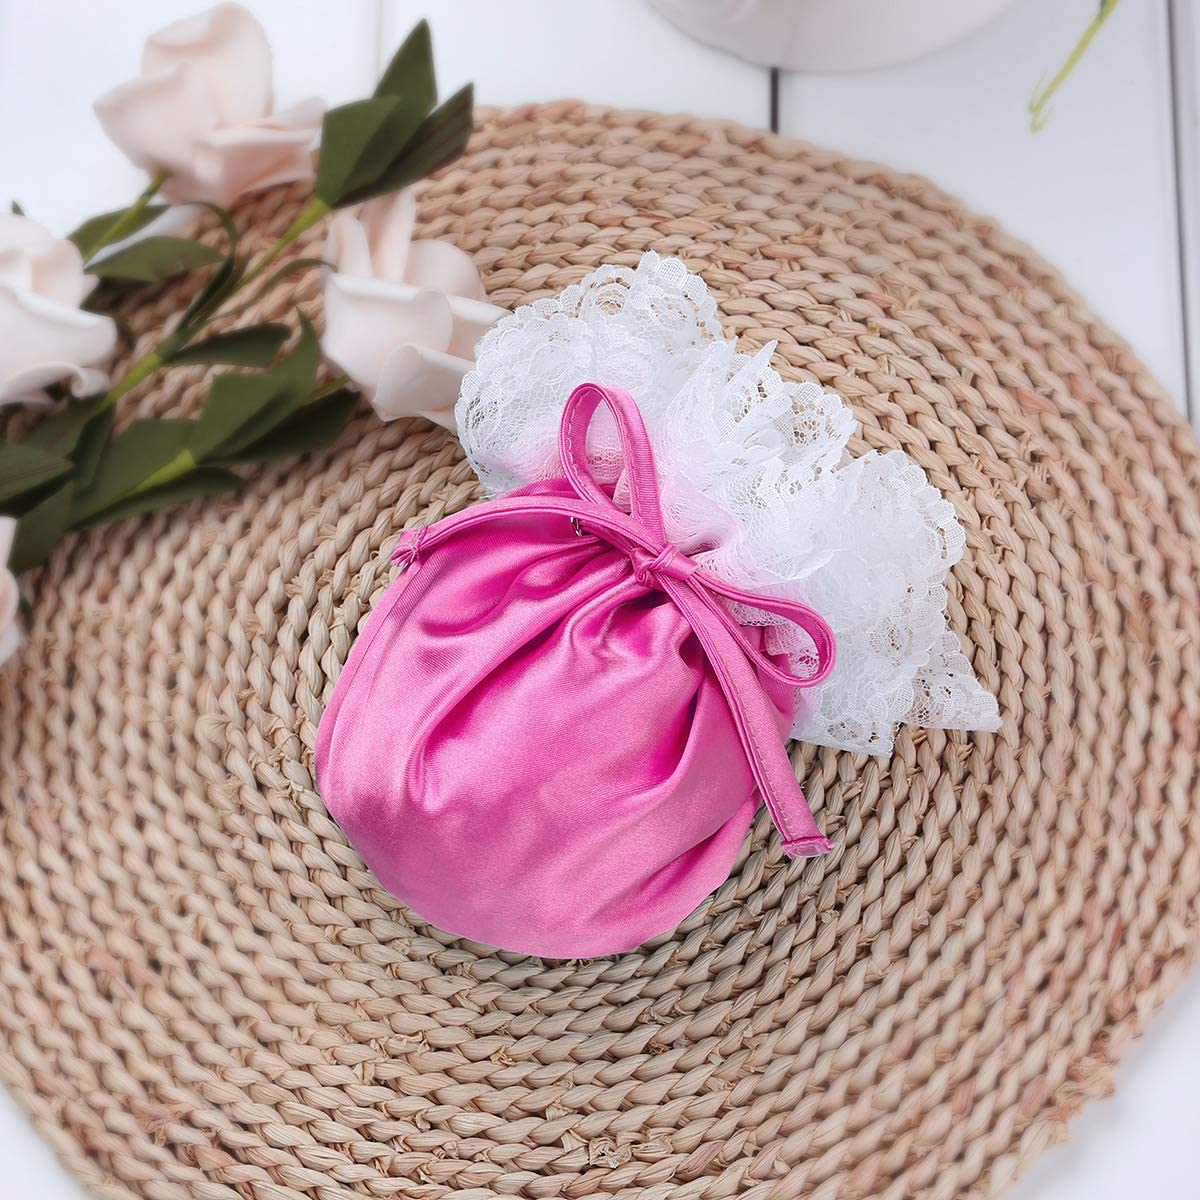 JEATHA Mens Satin Floral Lace Drawstring Sissy Pouch C-String Mini Briefs Underwear